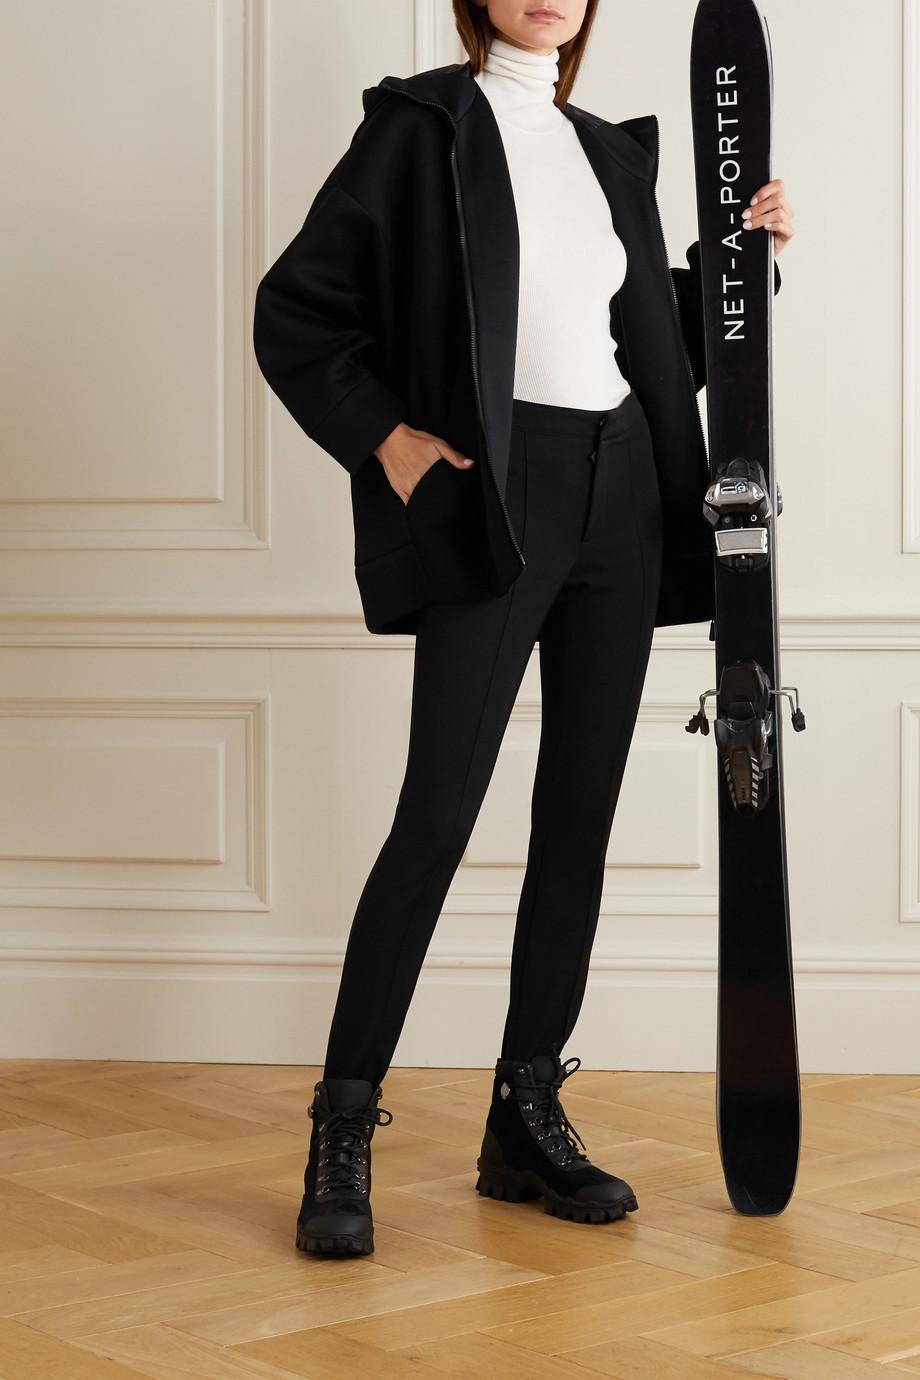 Moncler Grenoble Sportivo stirrup ski pants